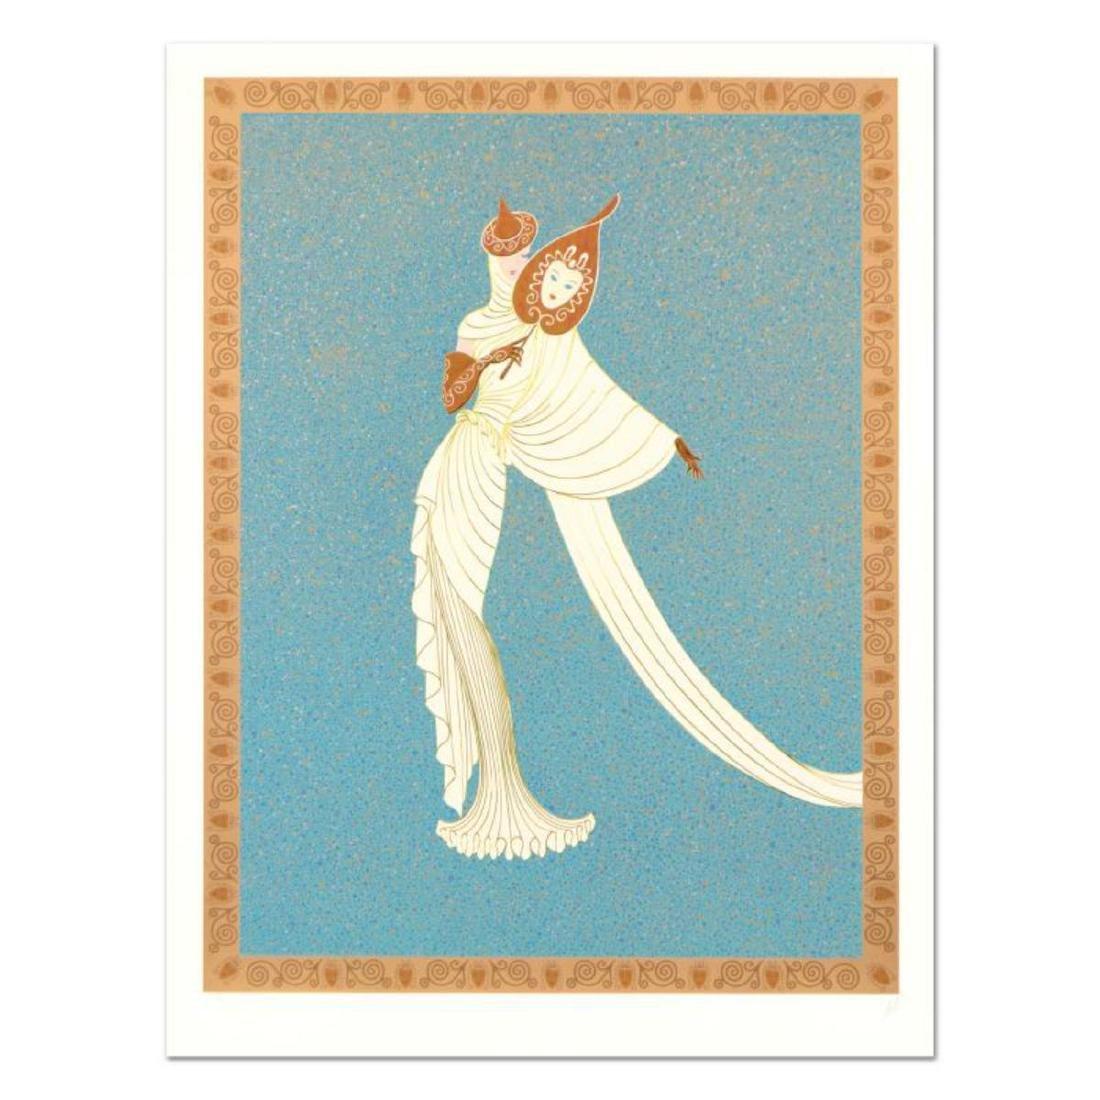 "Erte (1892-1990), ""Tanagra Turquoise"" Limited Edition"